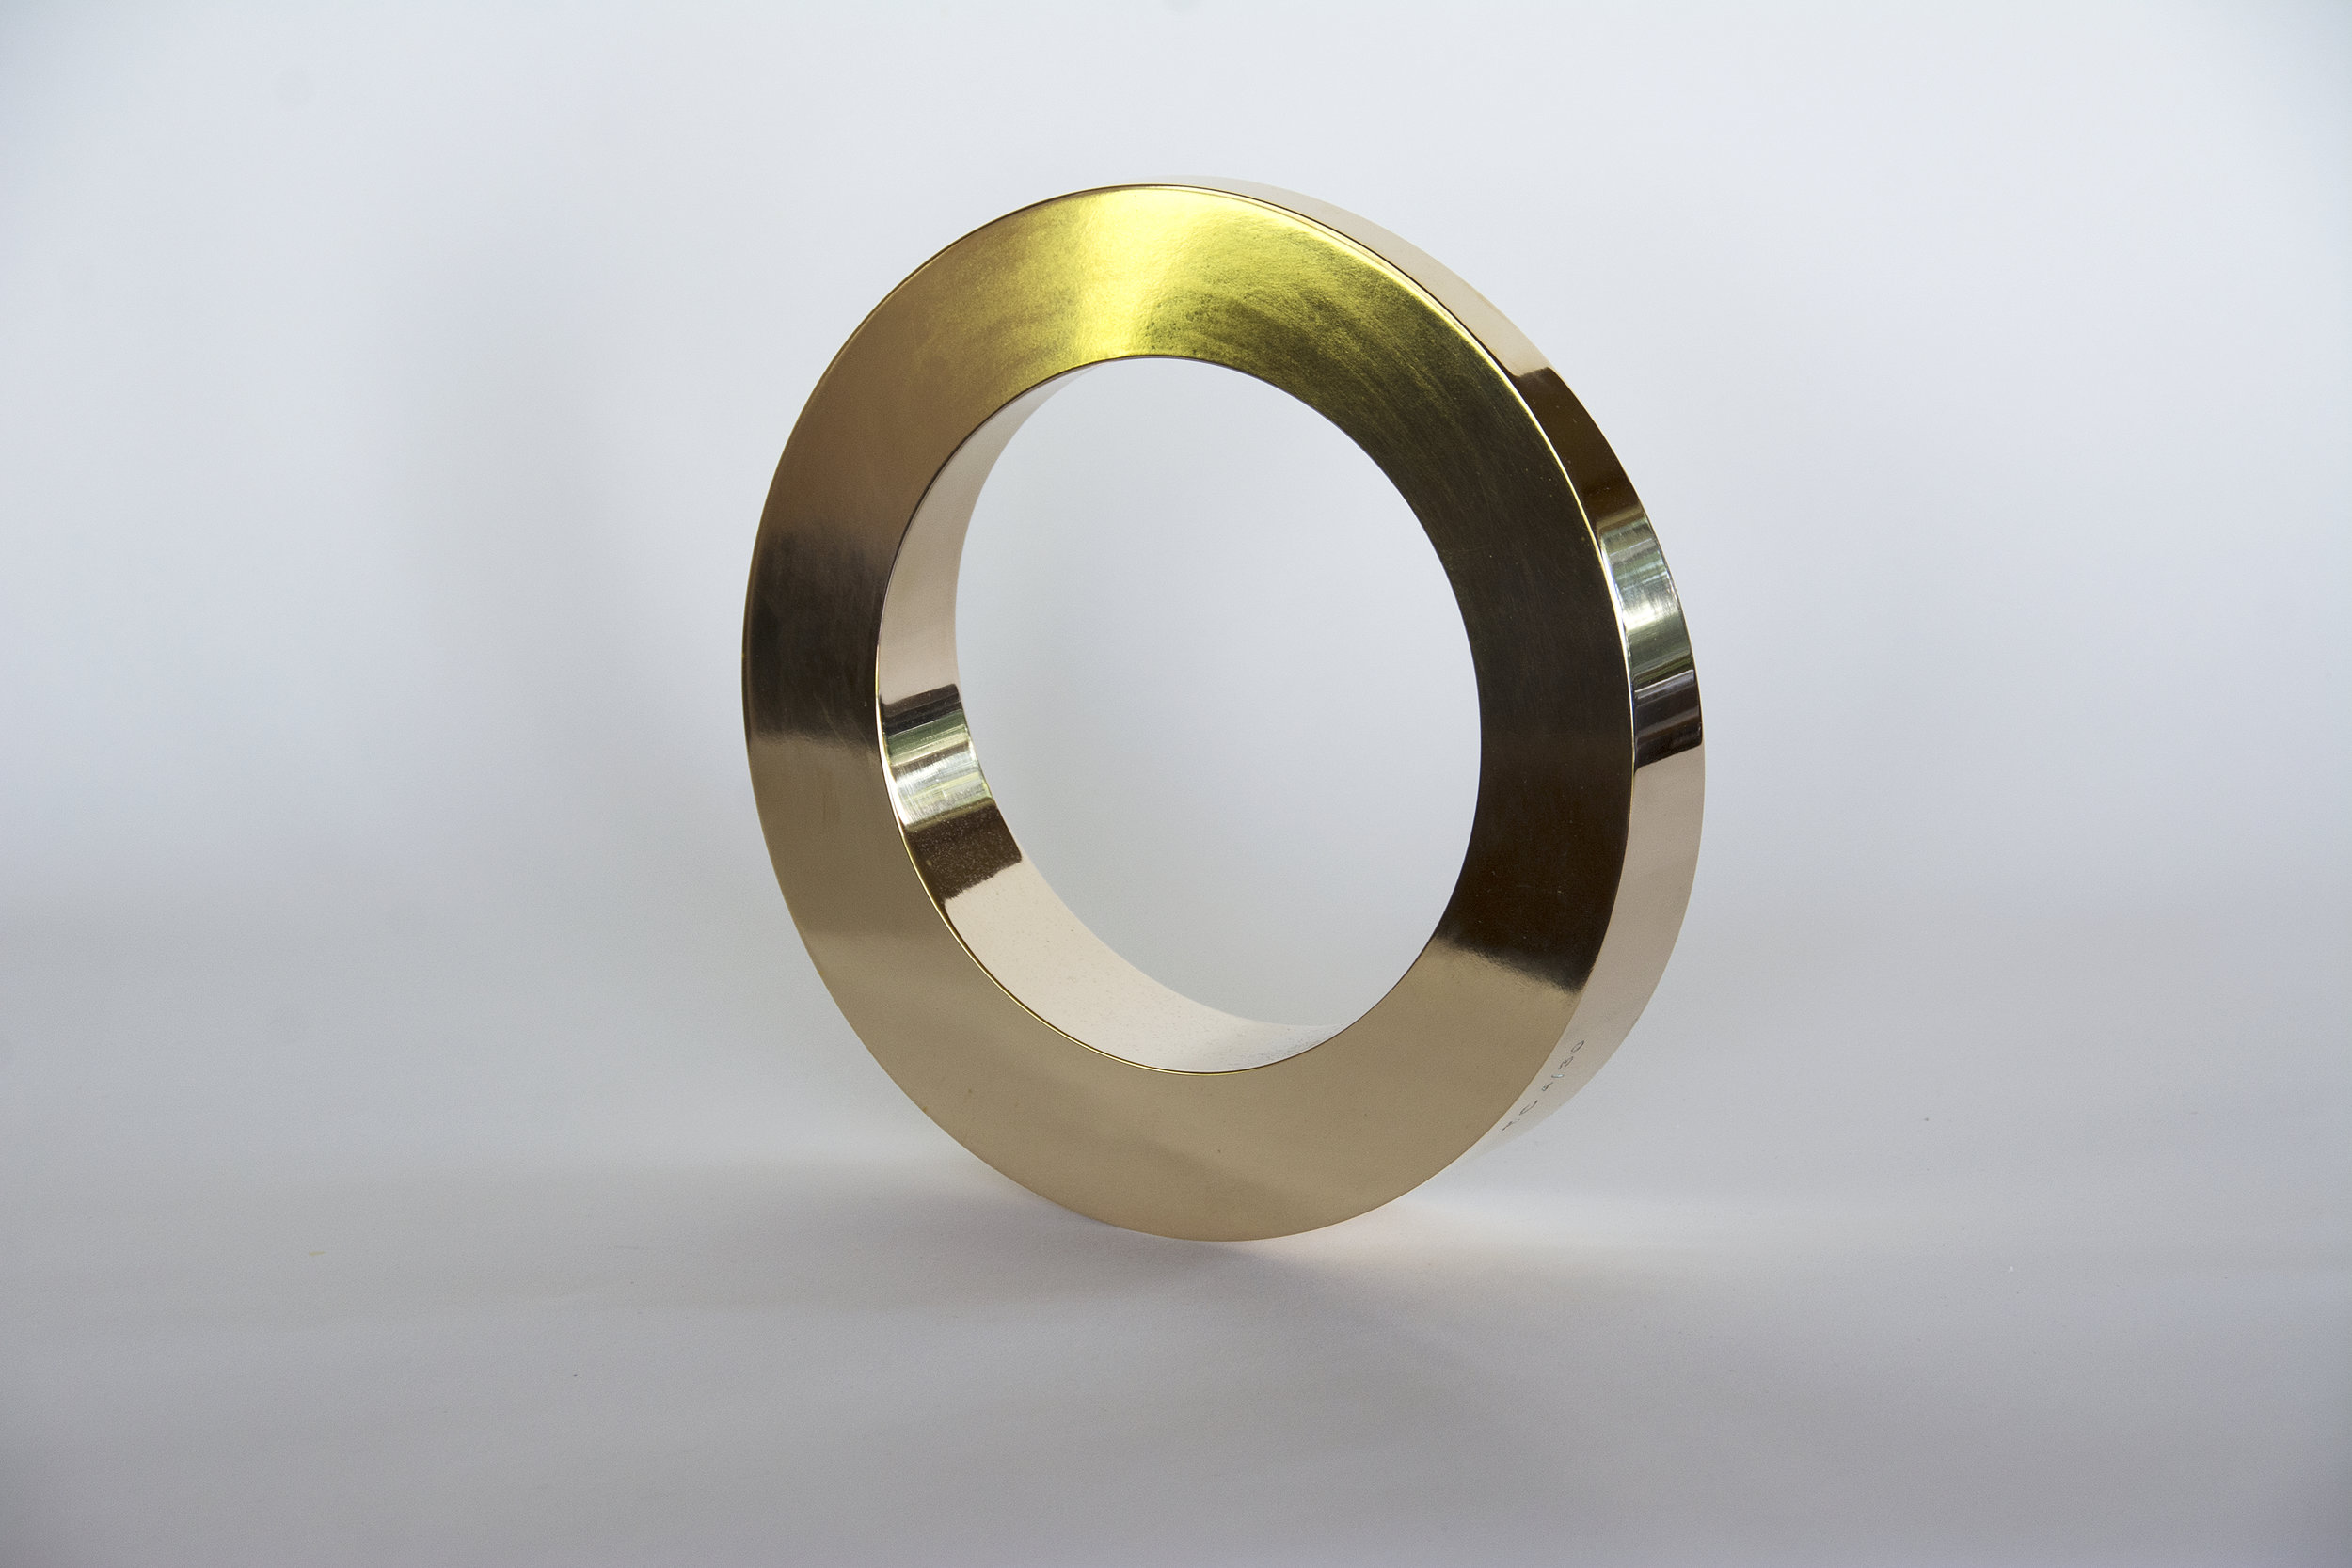 bronze, kinetic sculpture called rocker by tarik currimbhoy